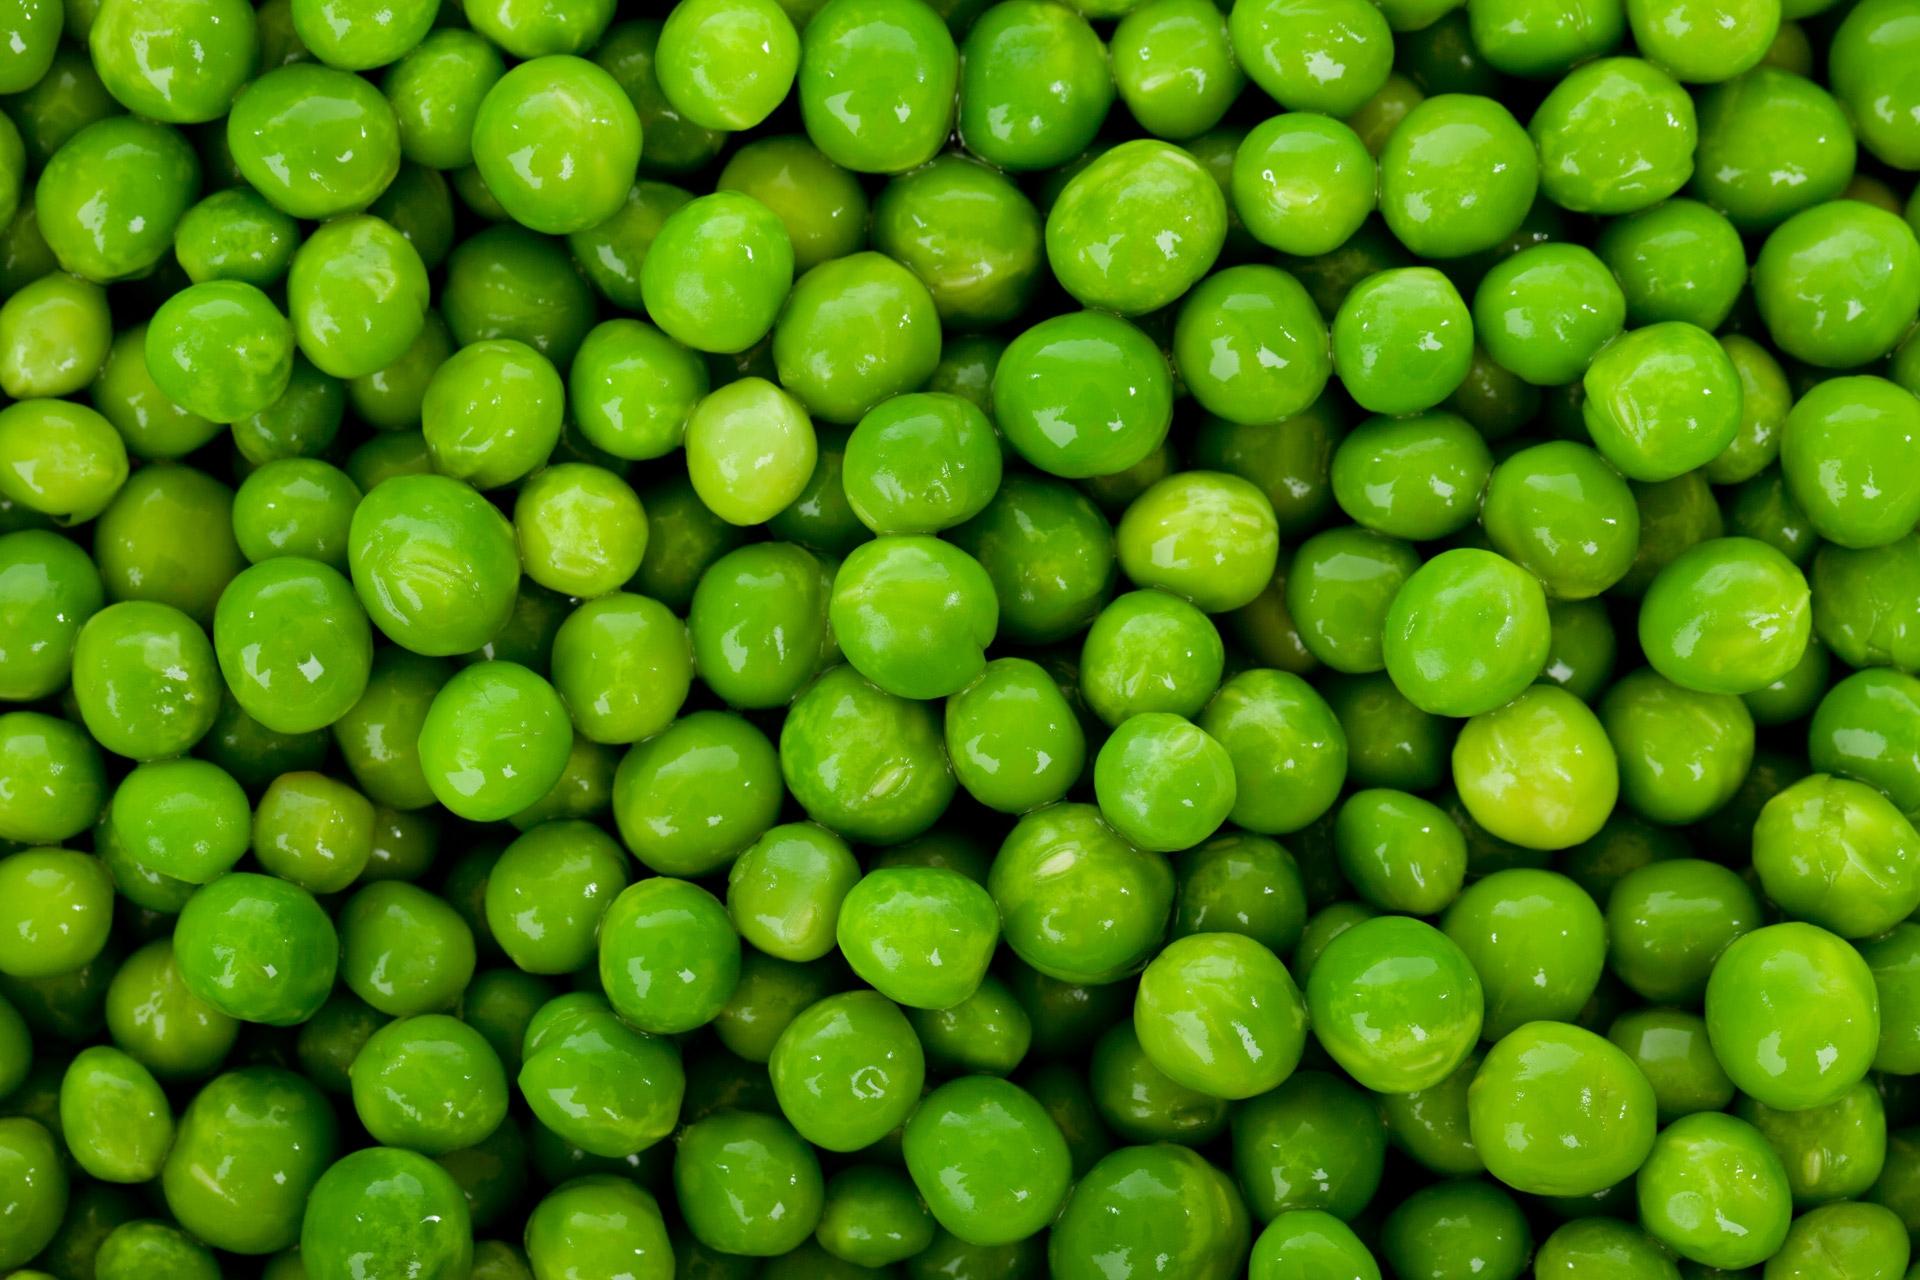 Peas Images